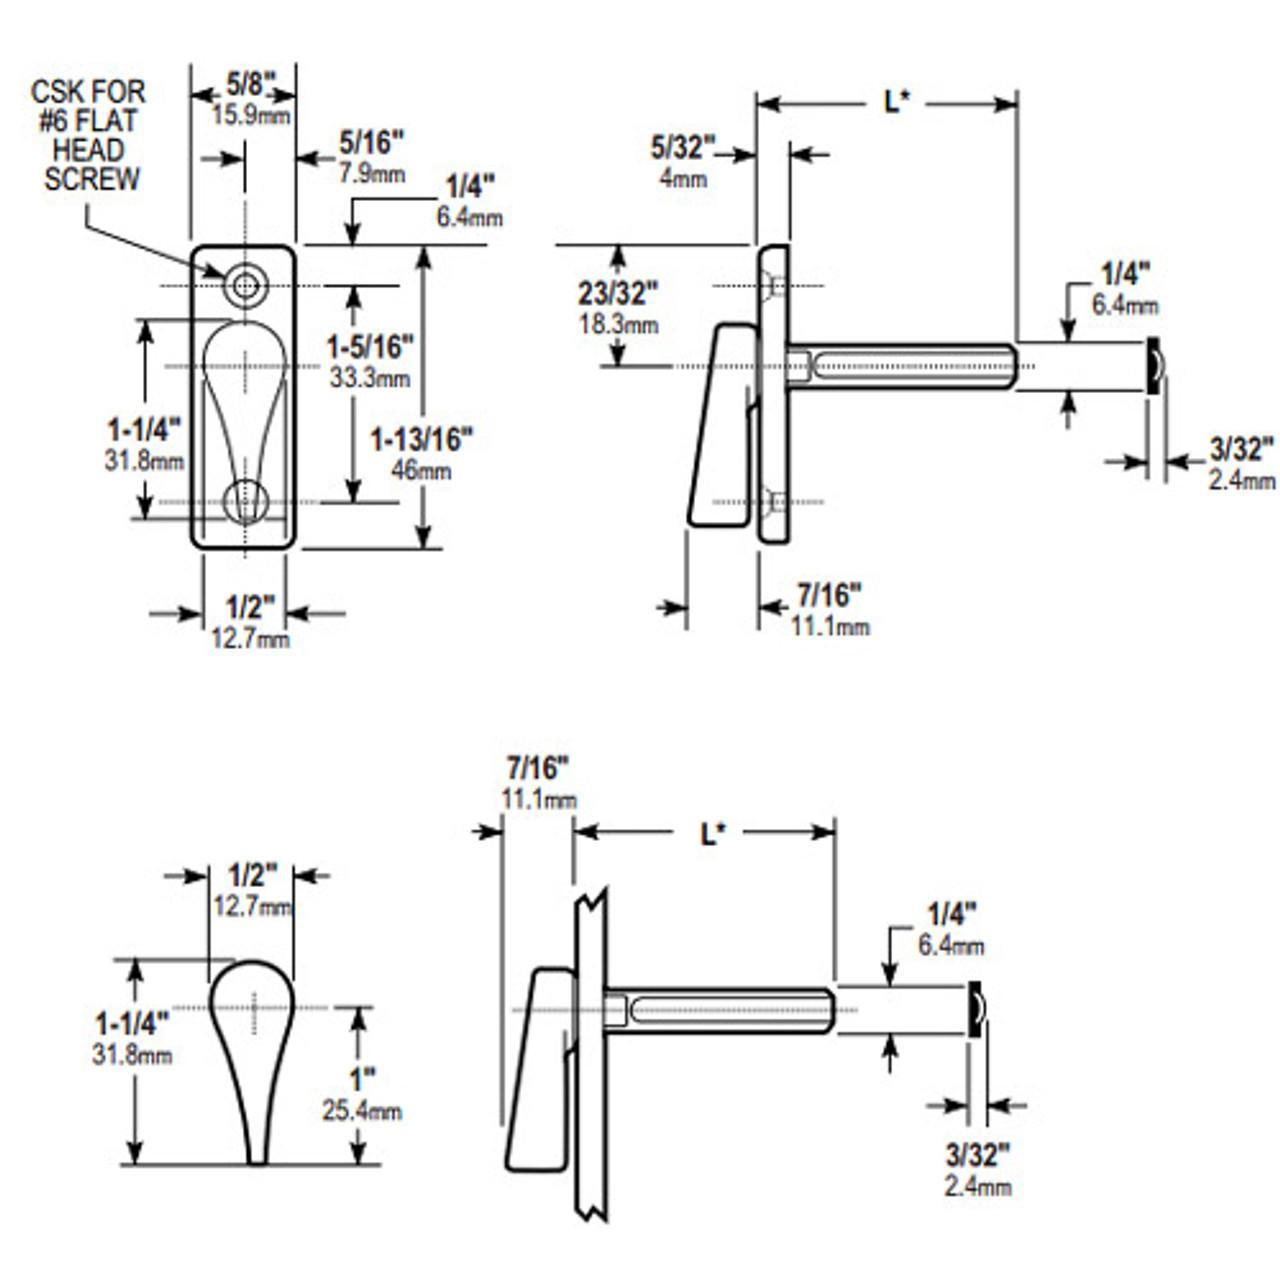 1000-21-12-119 Adams Rite 1000 Series Turns Dimensional View